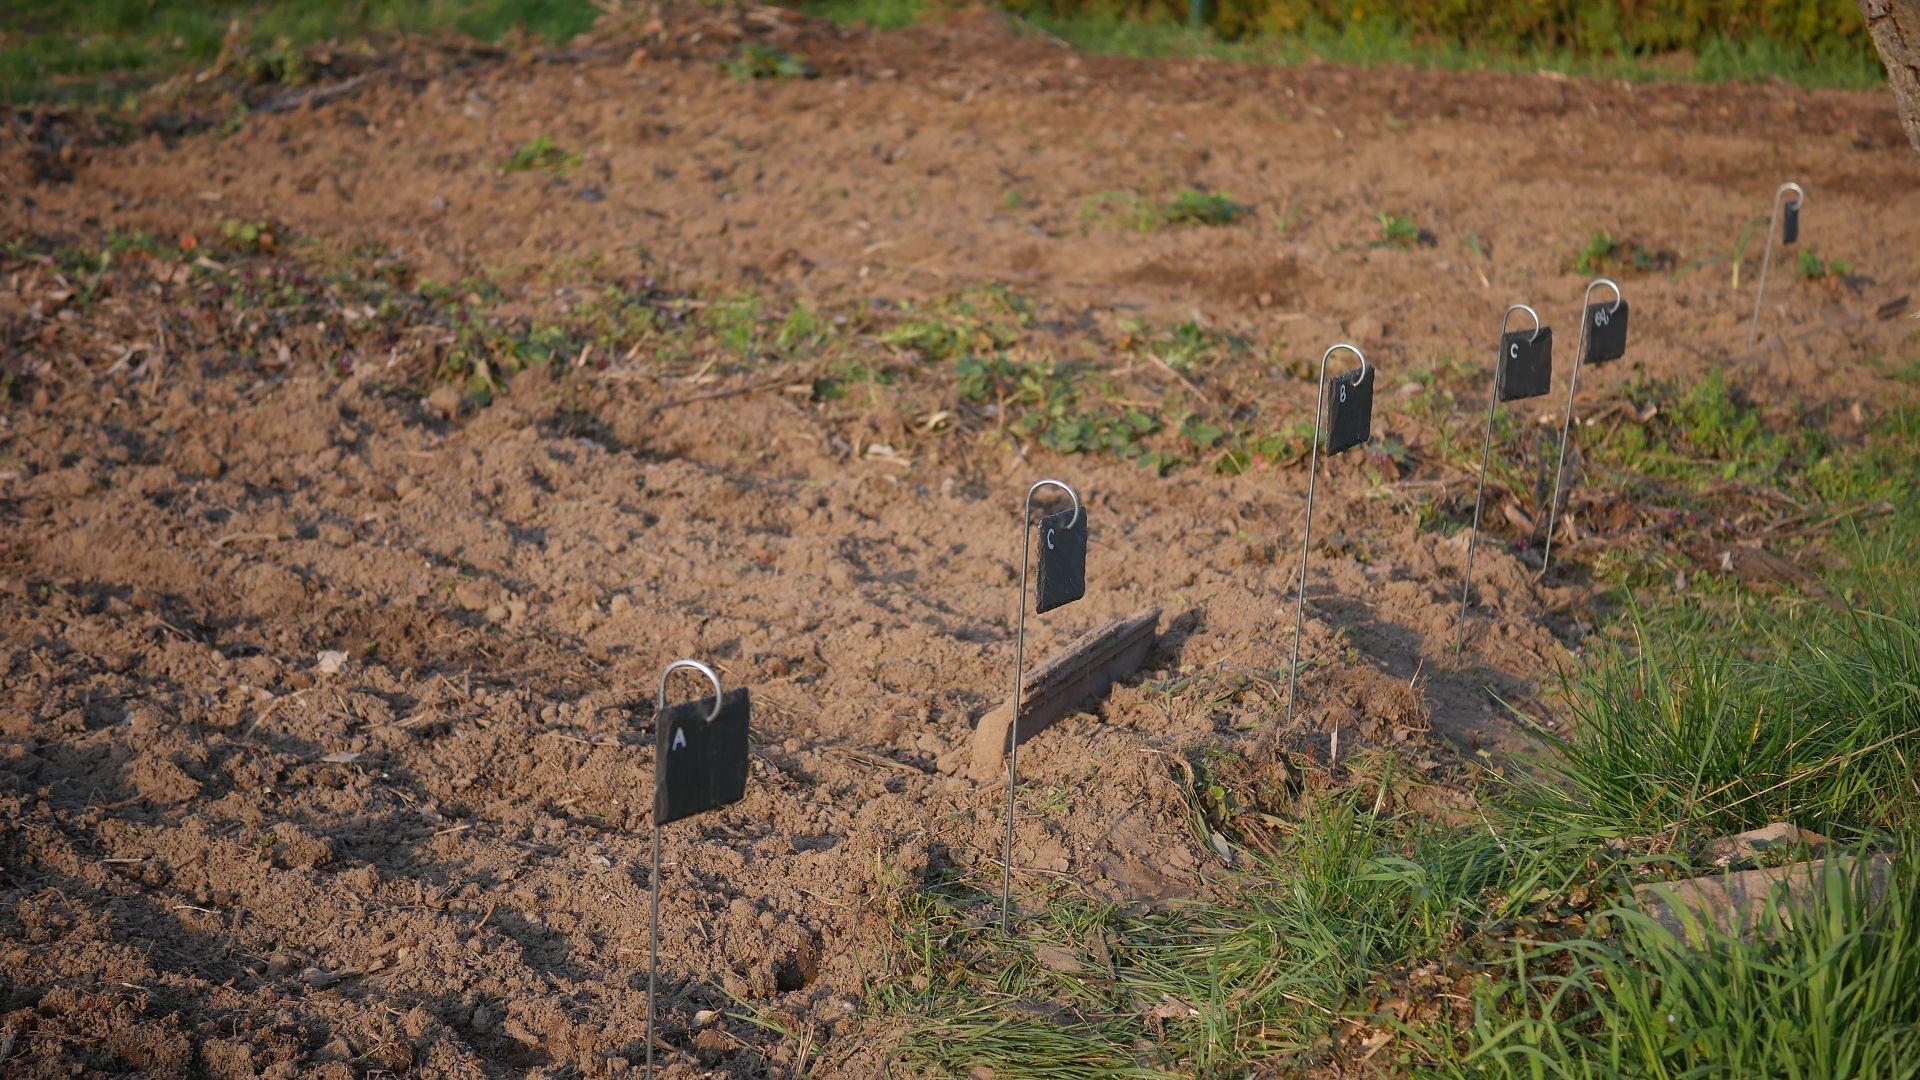 Gemüsebeet anlegen Mischkultur Beet Reihenmischkultur Beetplan Beetvorbereitung Gemüse im Garten eigenes Gemüse Pflanzschilder Schiefer Gute Nachbarn